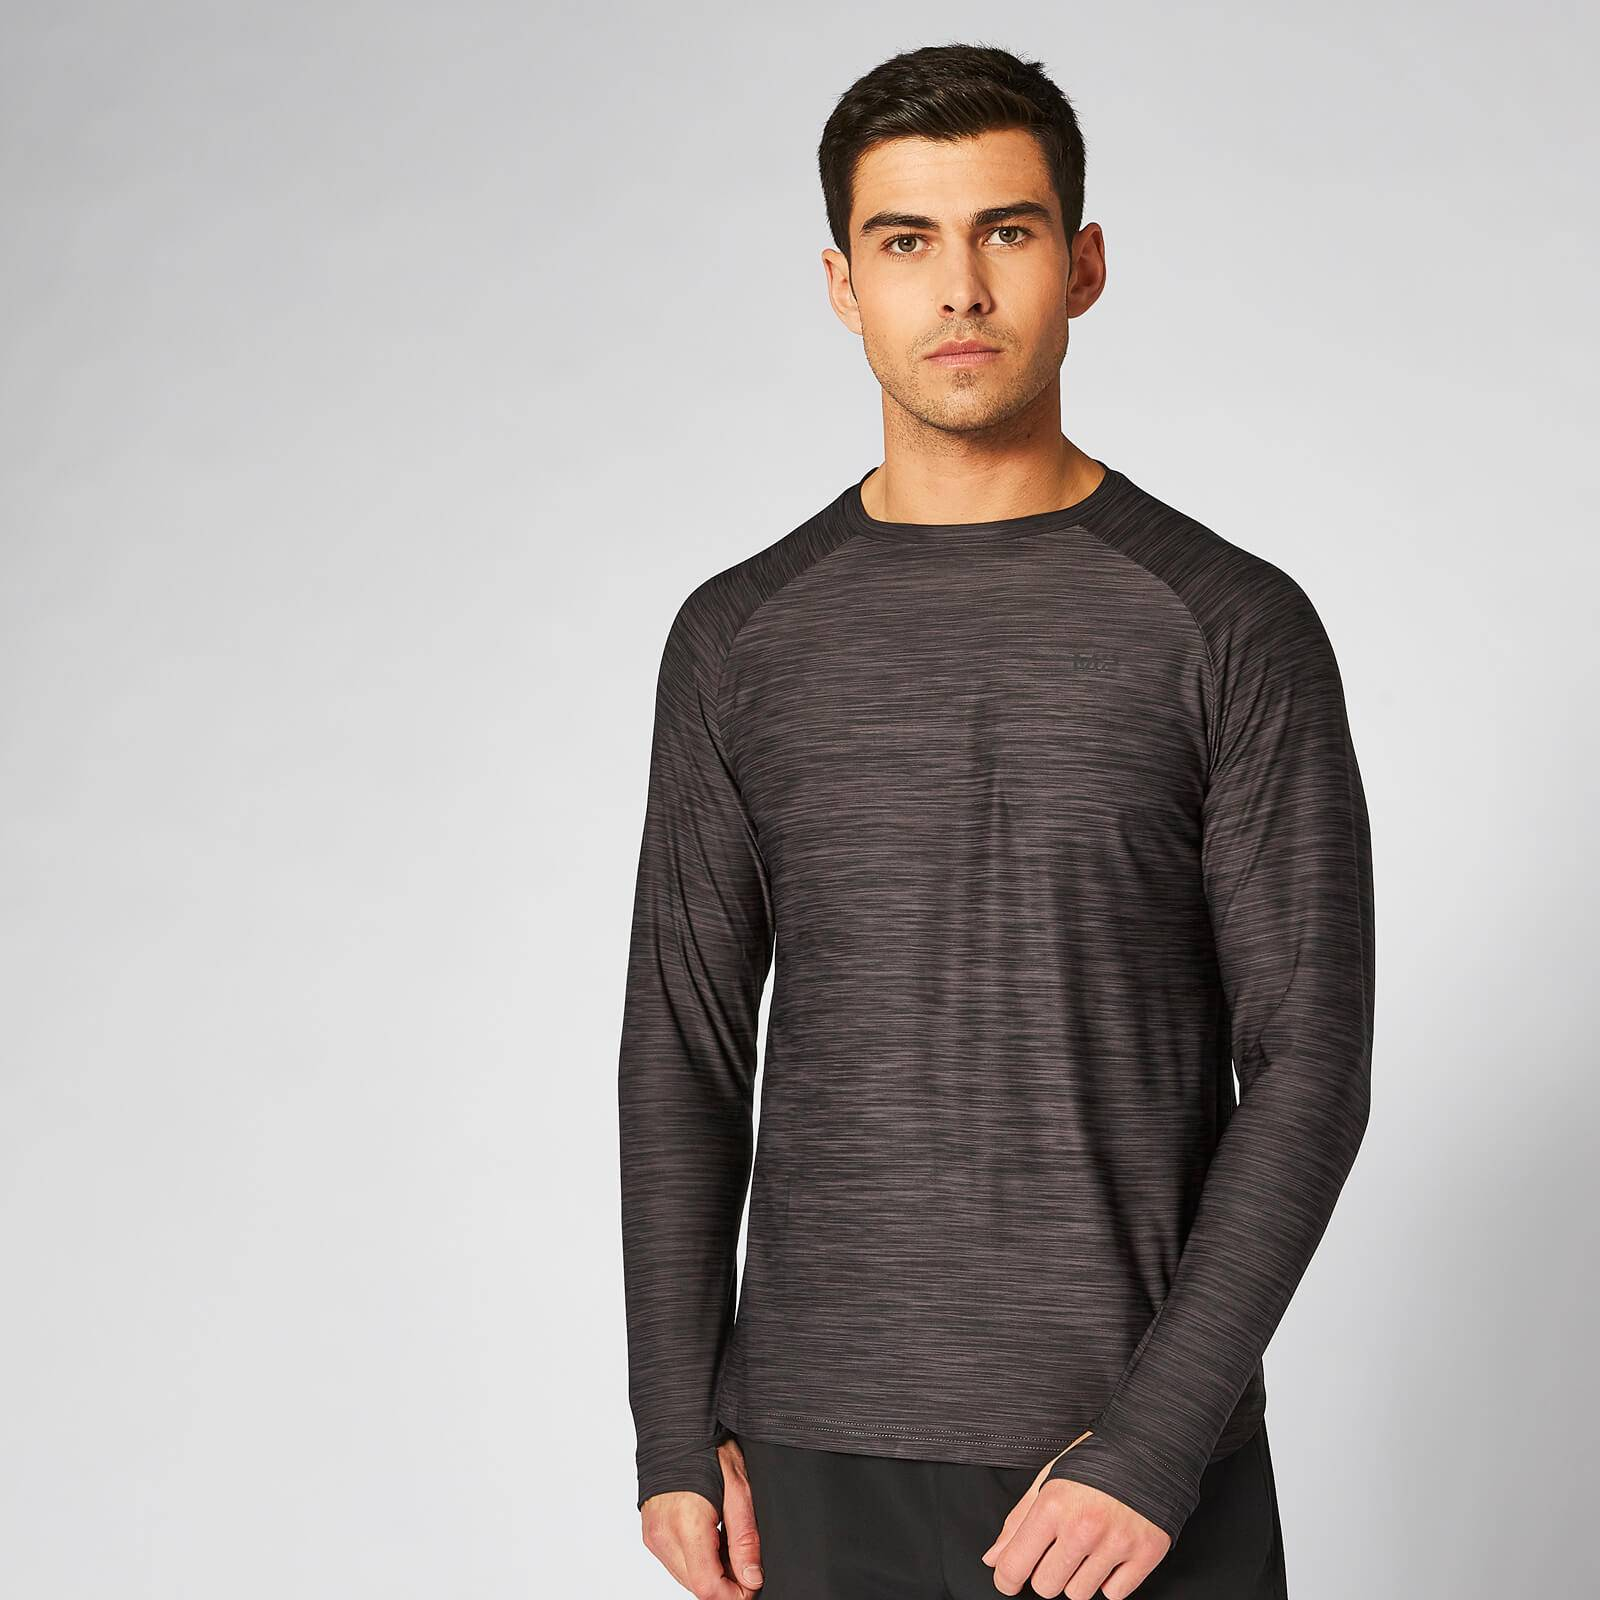 Myprotein Dry-Tech Infinity Long-Sleeve T-Shirt - Slate Marl - S